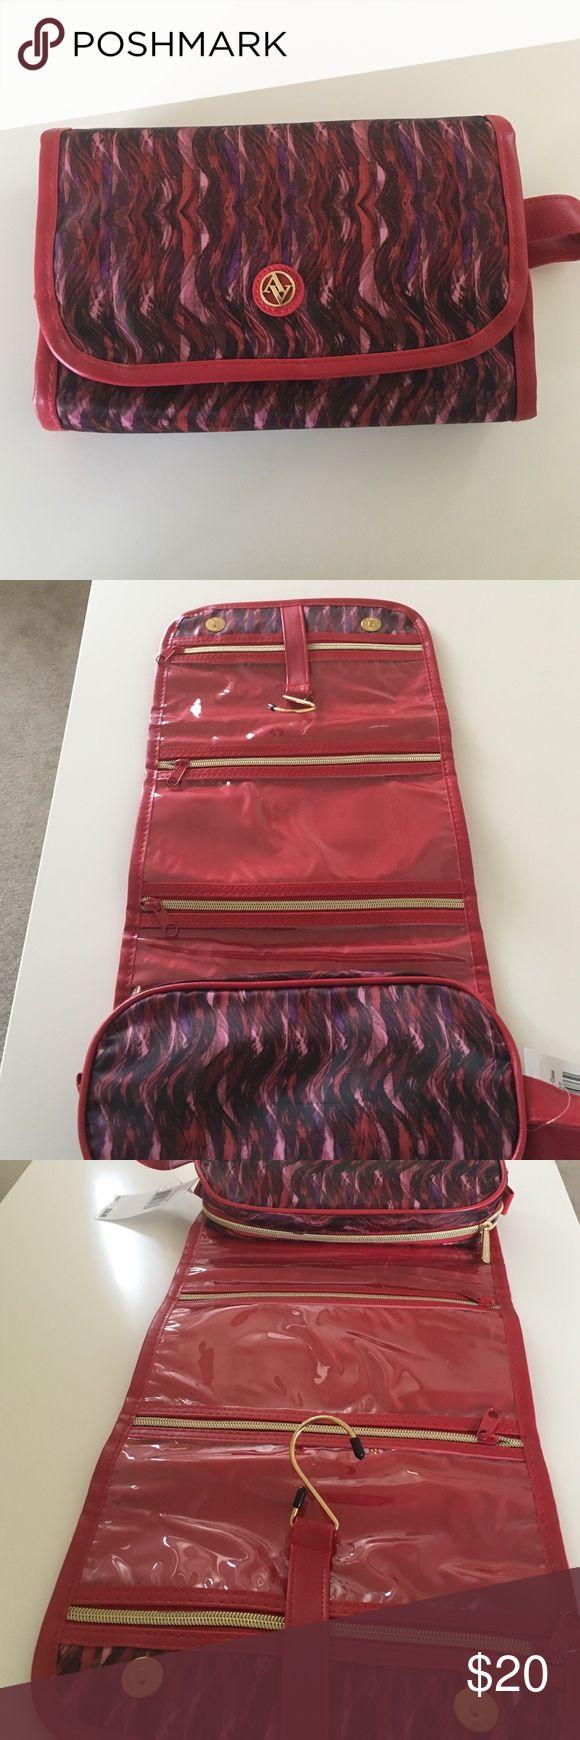 Adrienne Vittadini Hanging Beauty Case Great for travel! Adrienne Vittadini Bags Cosmetic Bags & Cases